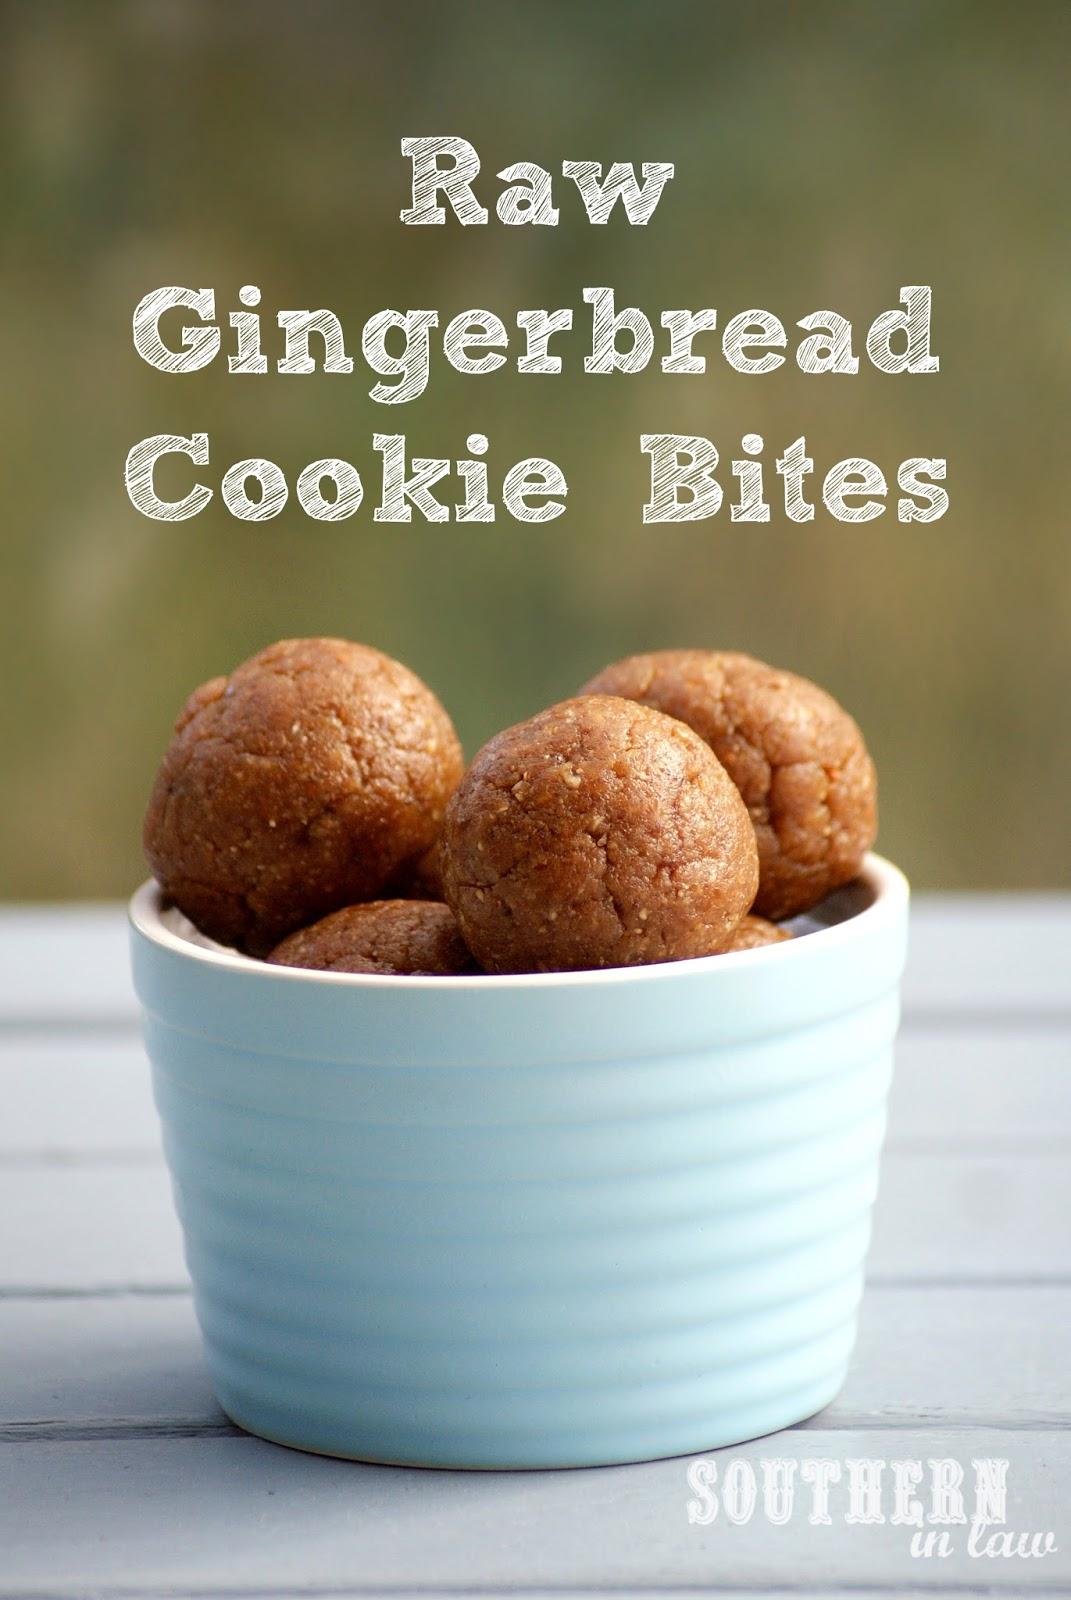 Raw Gingerbread Cookie Dough Bites - Vegan, Raw, Gluten Free